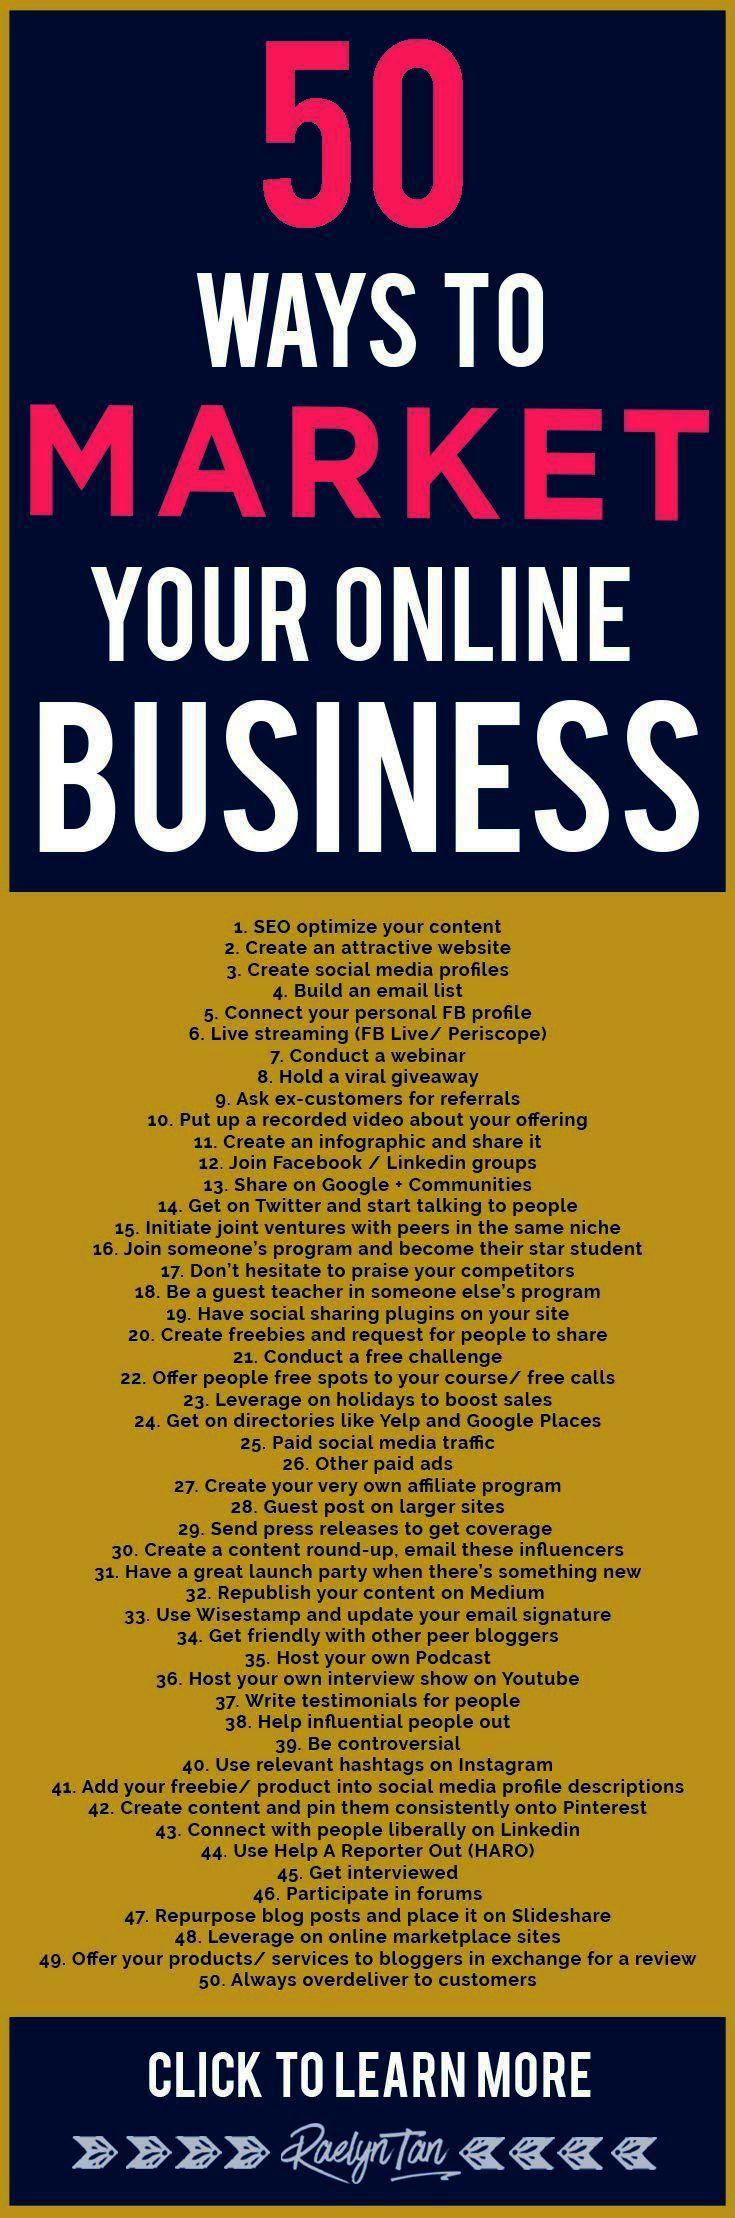 Start Online Affiliate Marketing Business By Nursing Home Business Plan Pdf Under Home Business Ideas Ca Affiliate Marketing Business Marketing Online Business